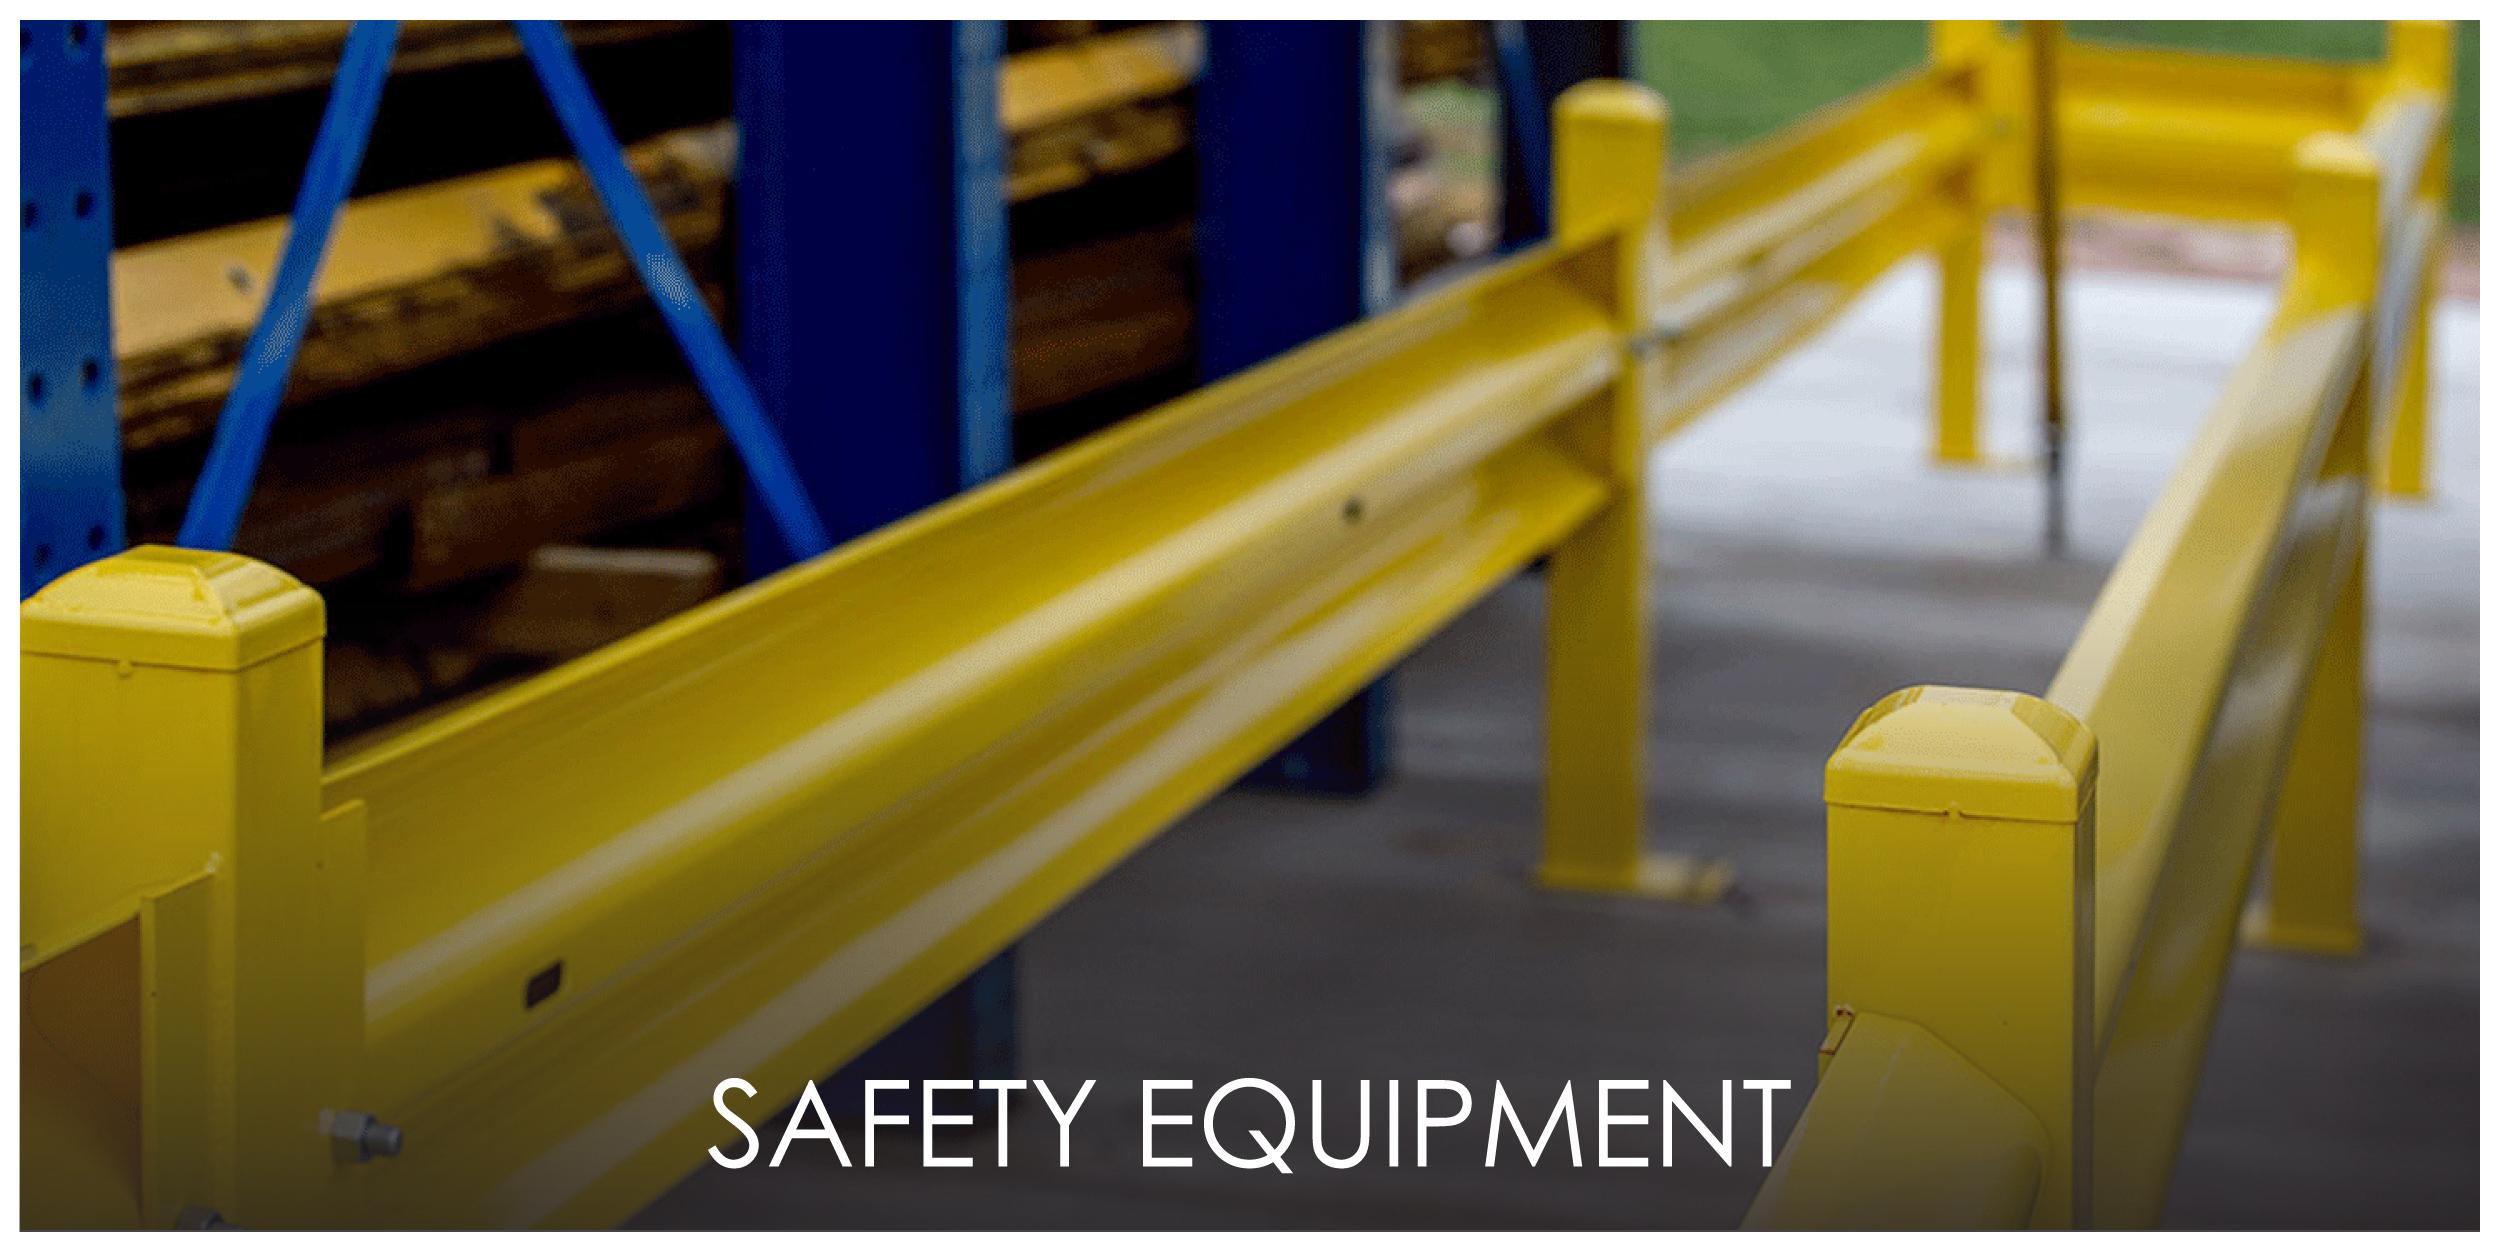 SafetyEquipment-Front-Page.jpg